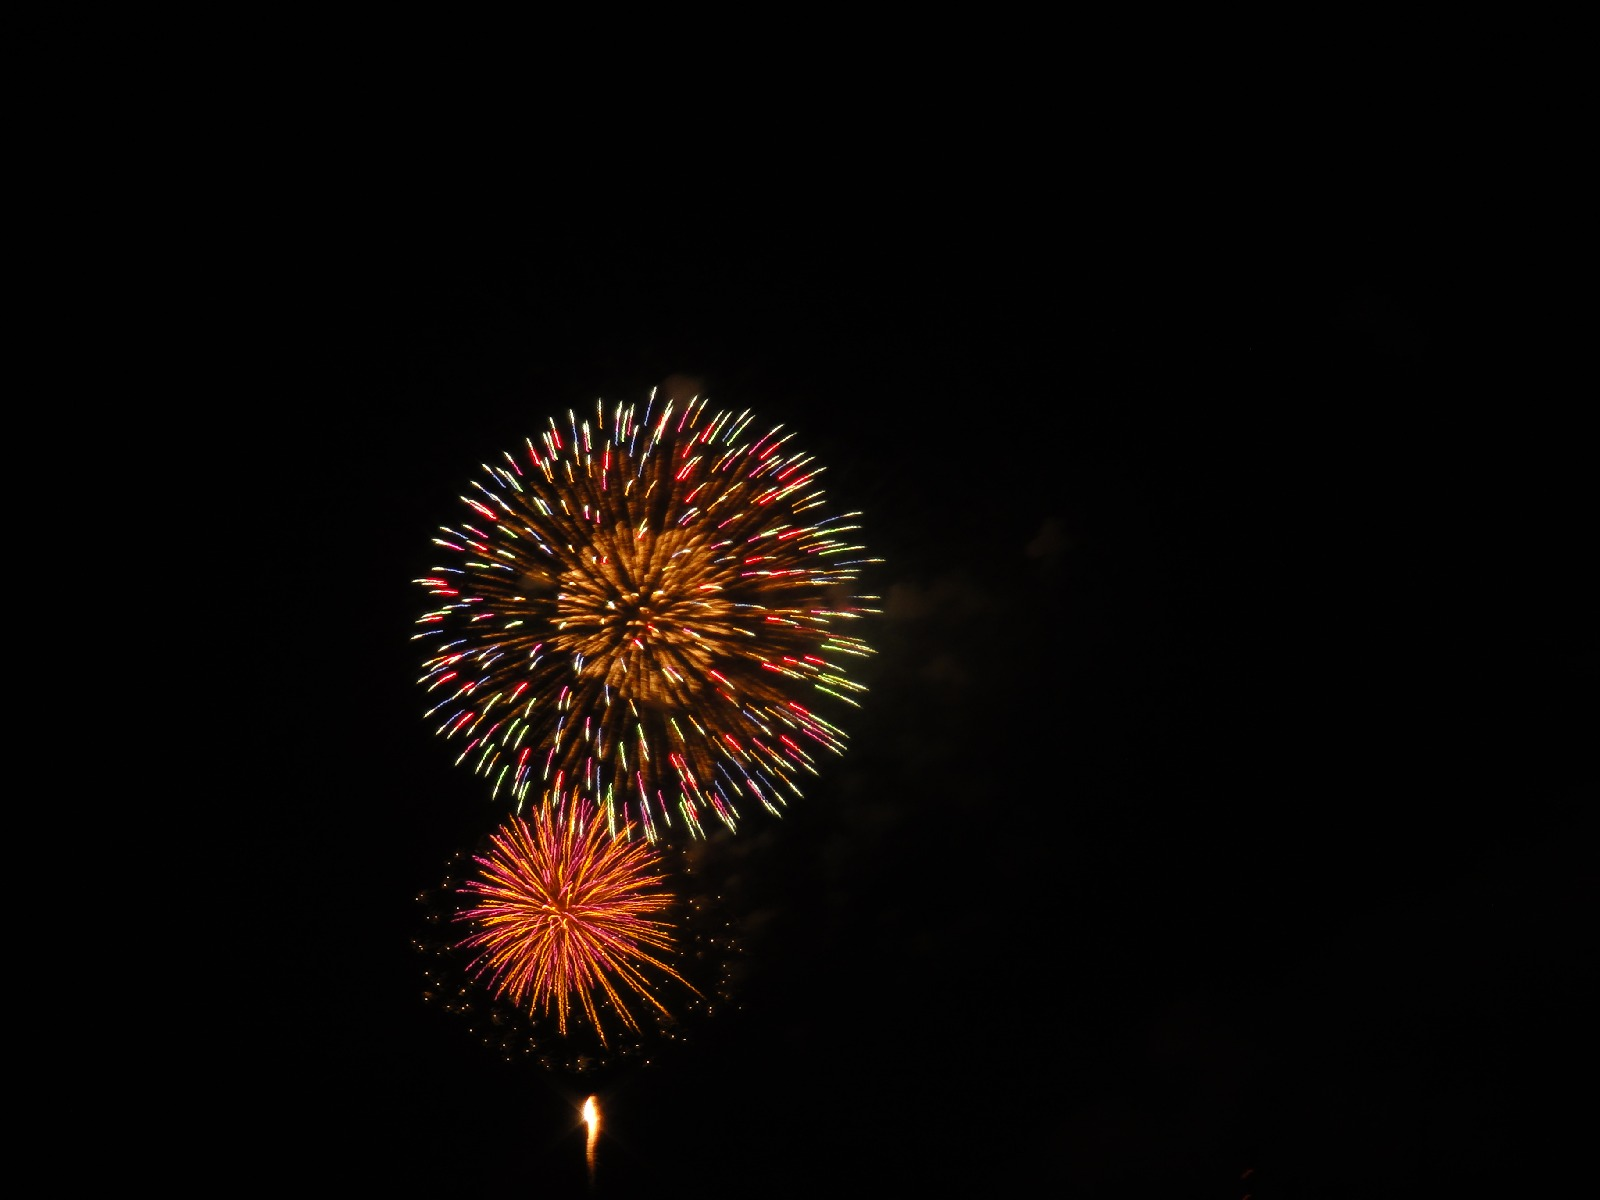 120728kasaokafireflower_037.jpg